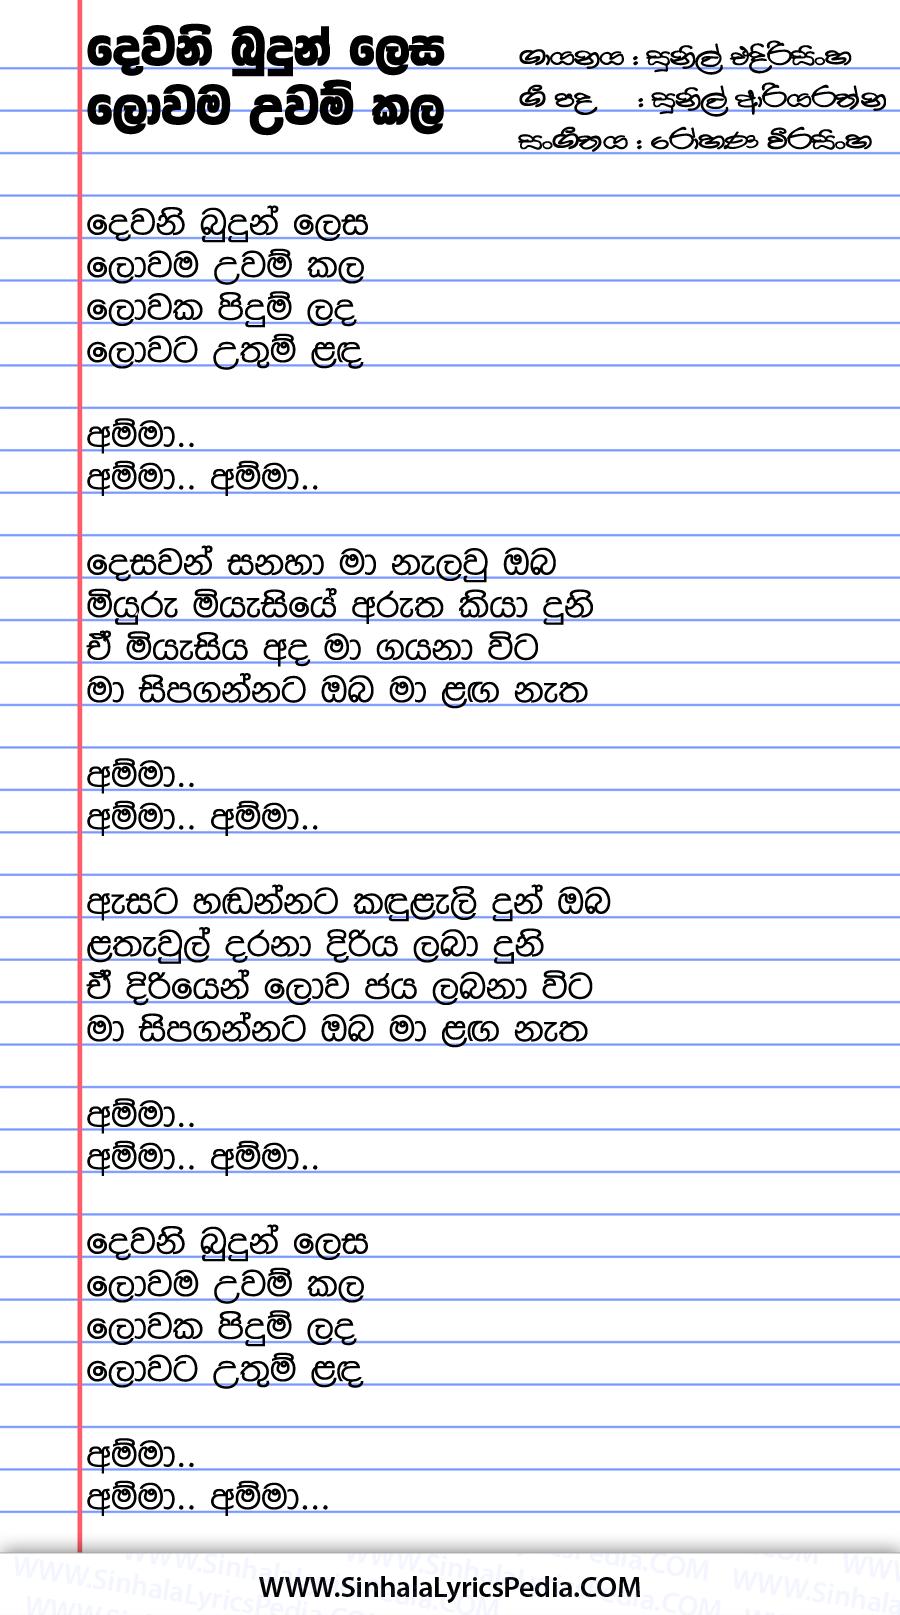 Dewani Budun Lesa Lowama Uwam Kala Song Lyrics